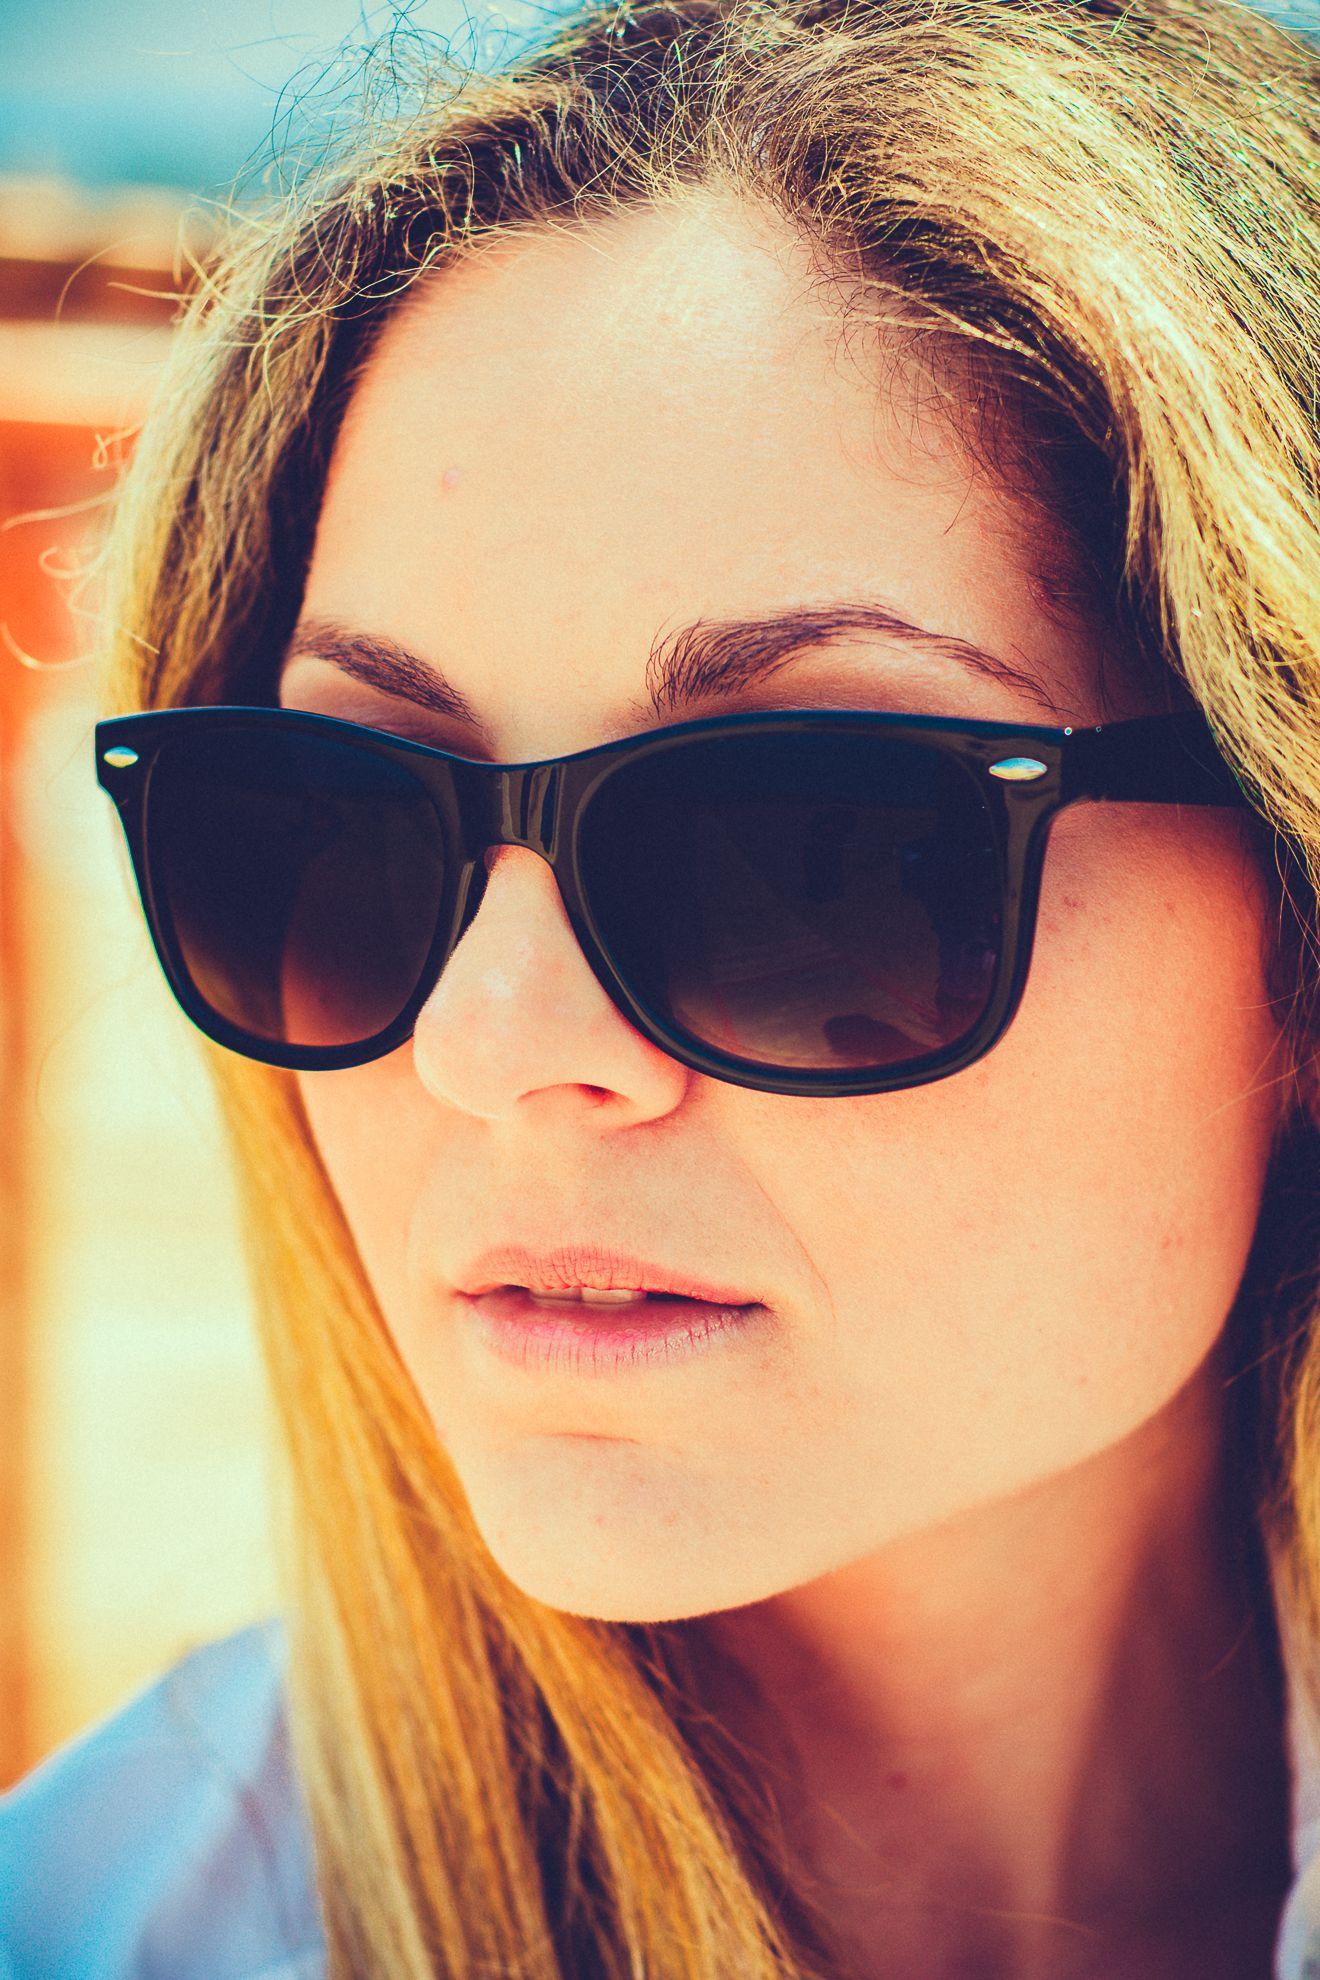 norain / occhiali da sole norain